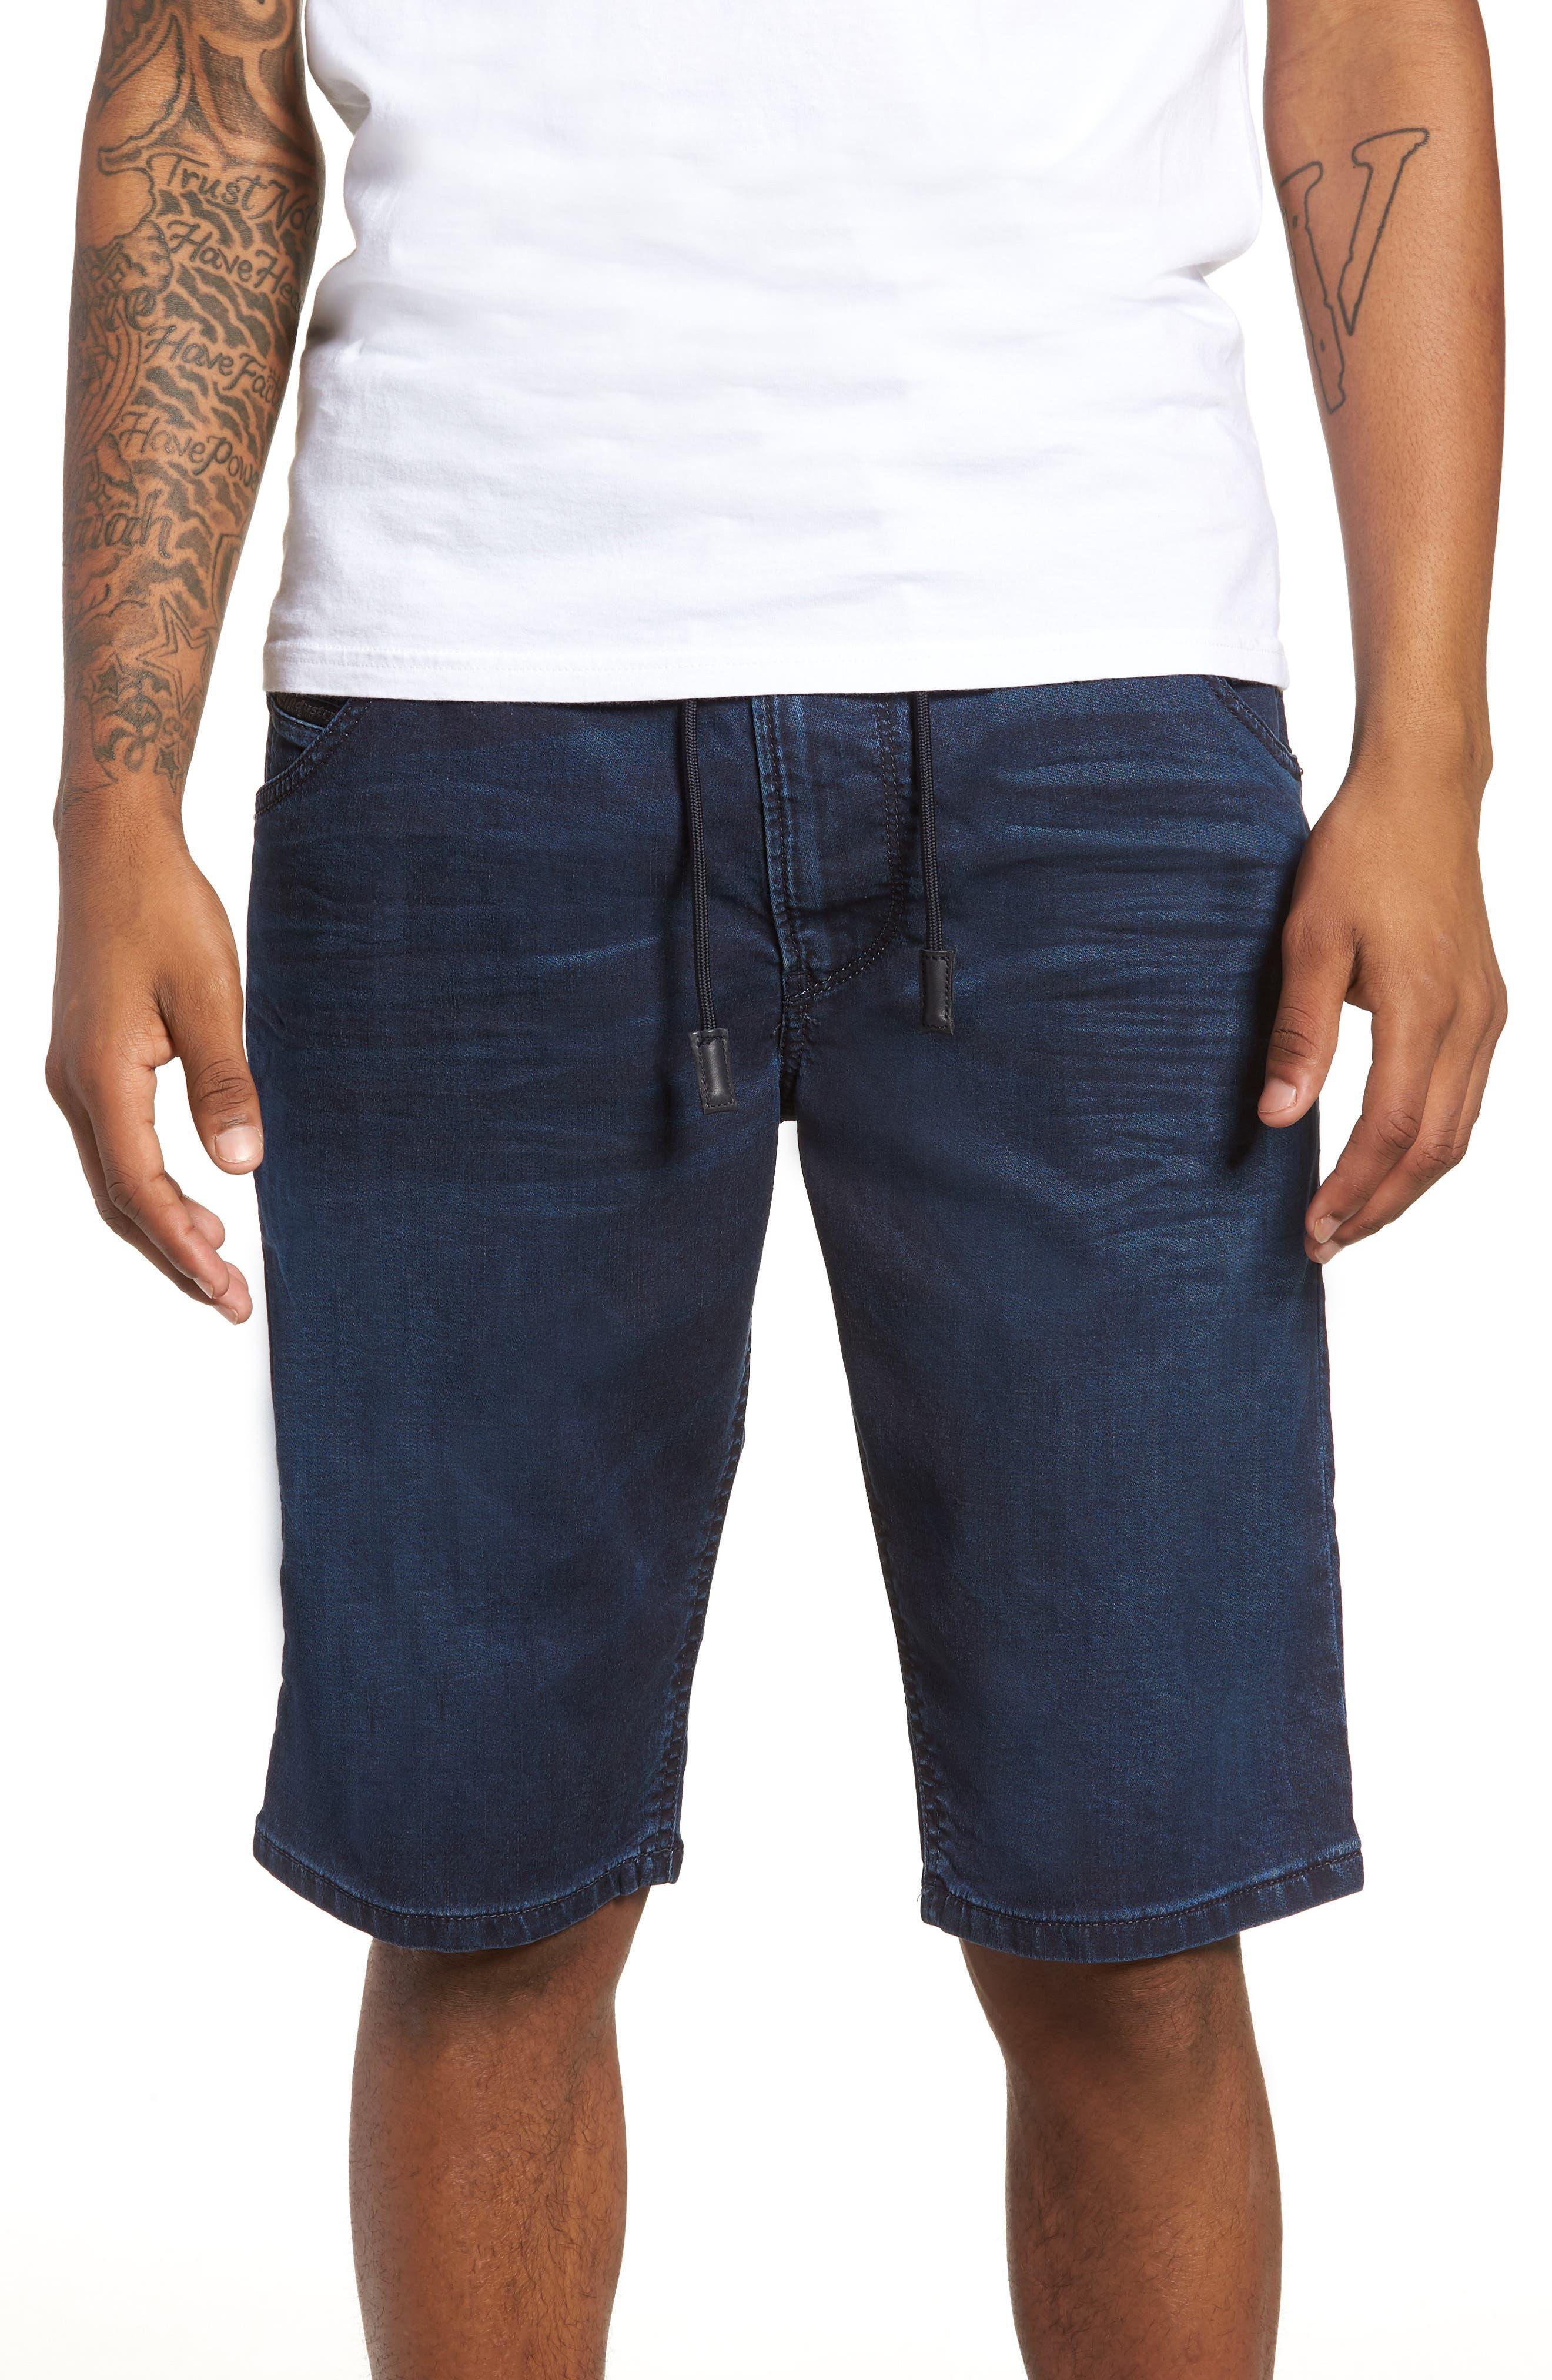 Krooshort Denim Shorts,                         Main,                         color, 0699C